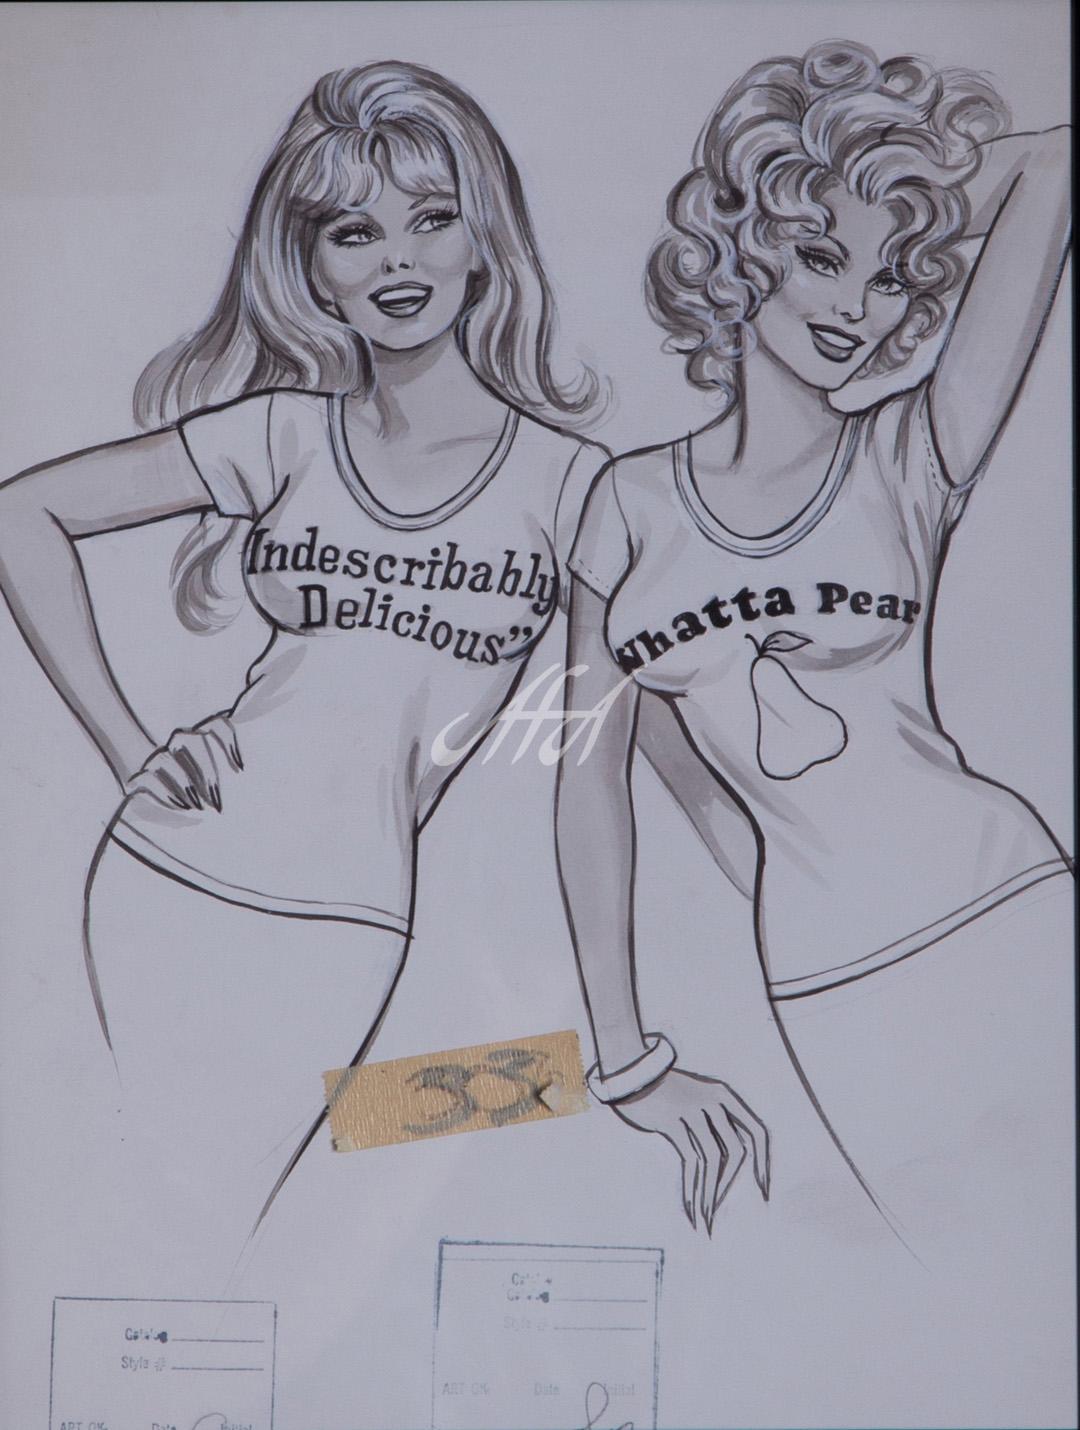 HCFM_Mellinger_ue0103_twogirls_framed LoRes watermark.jpg